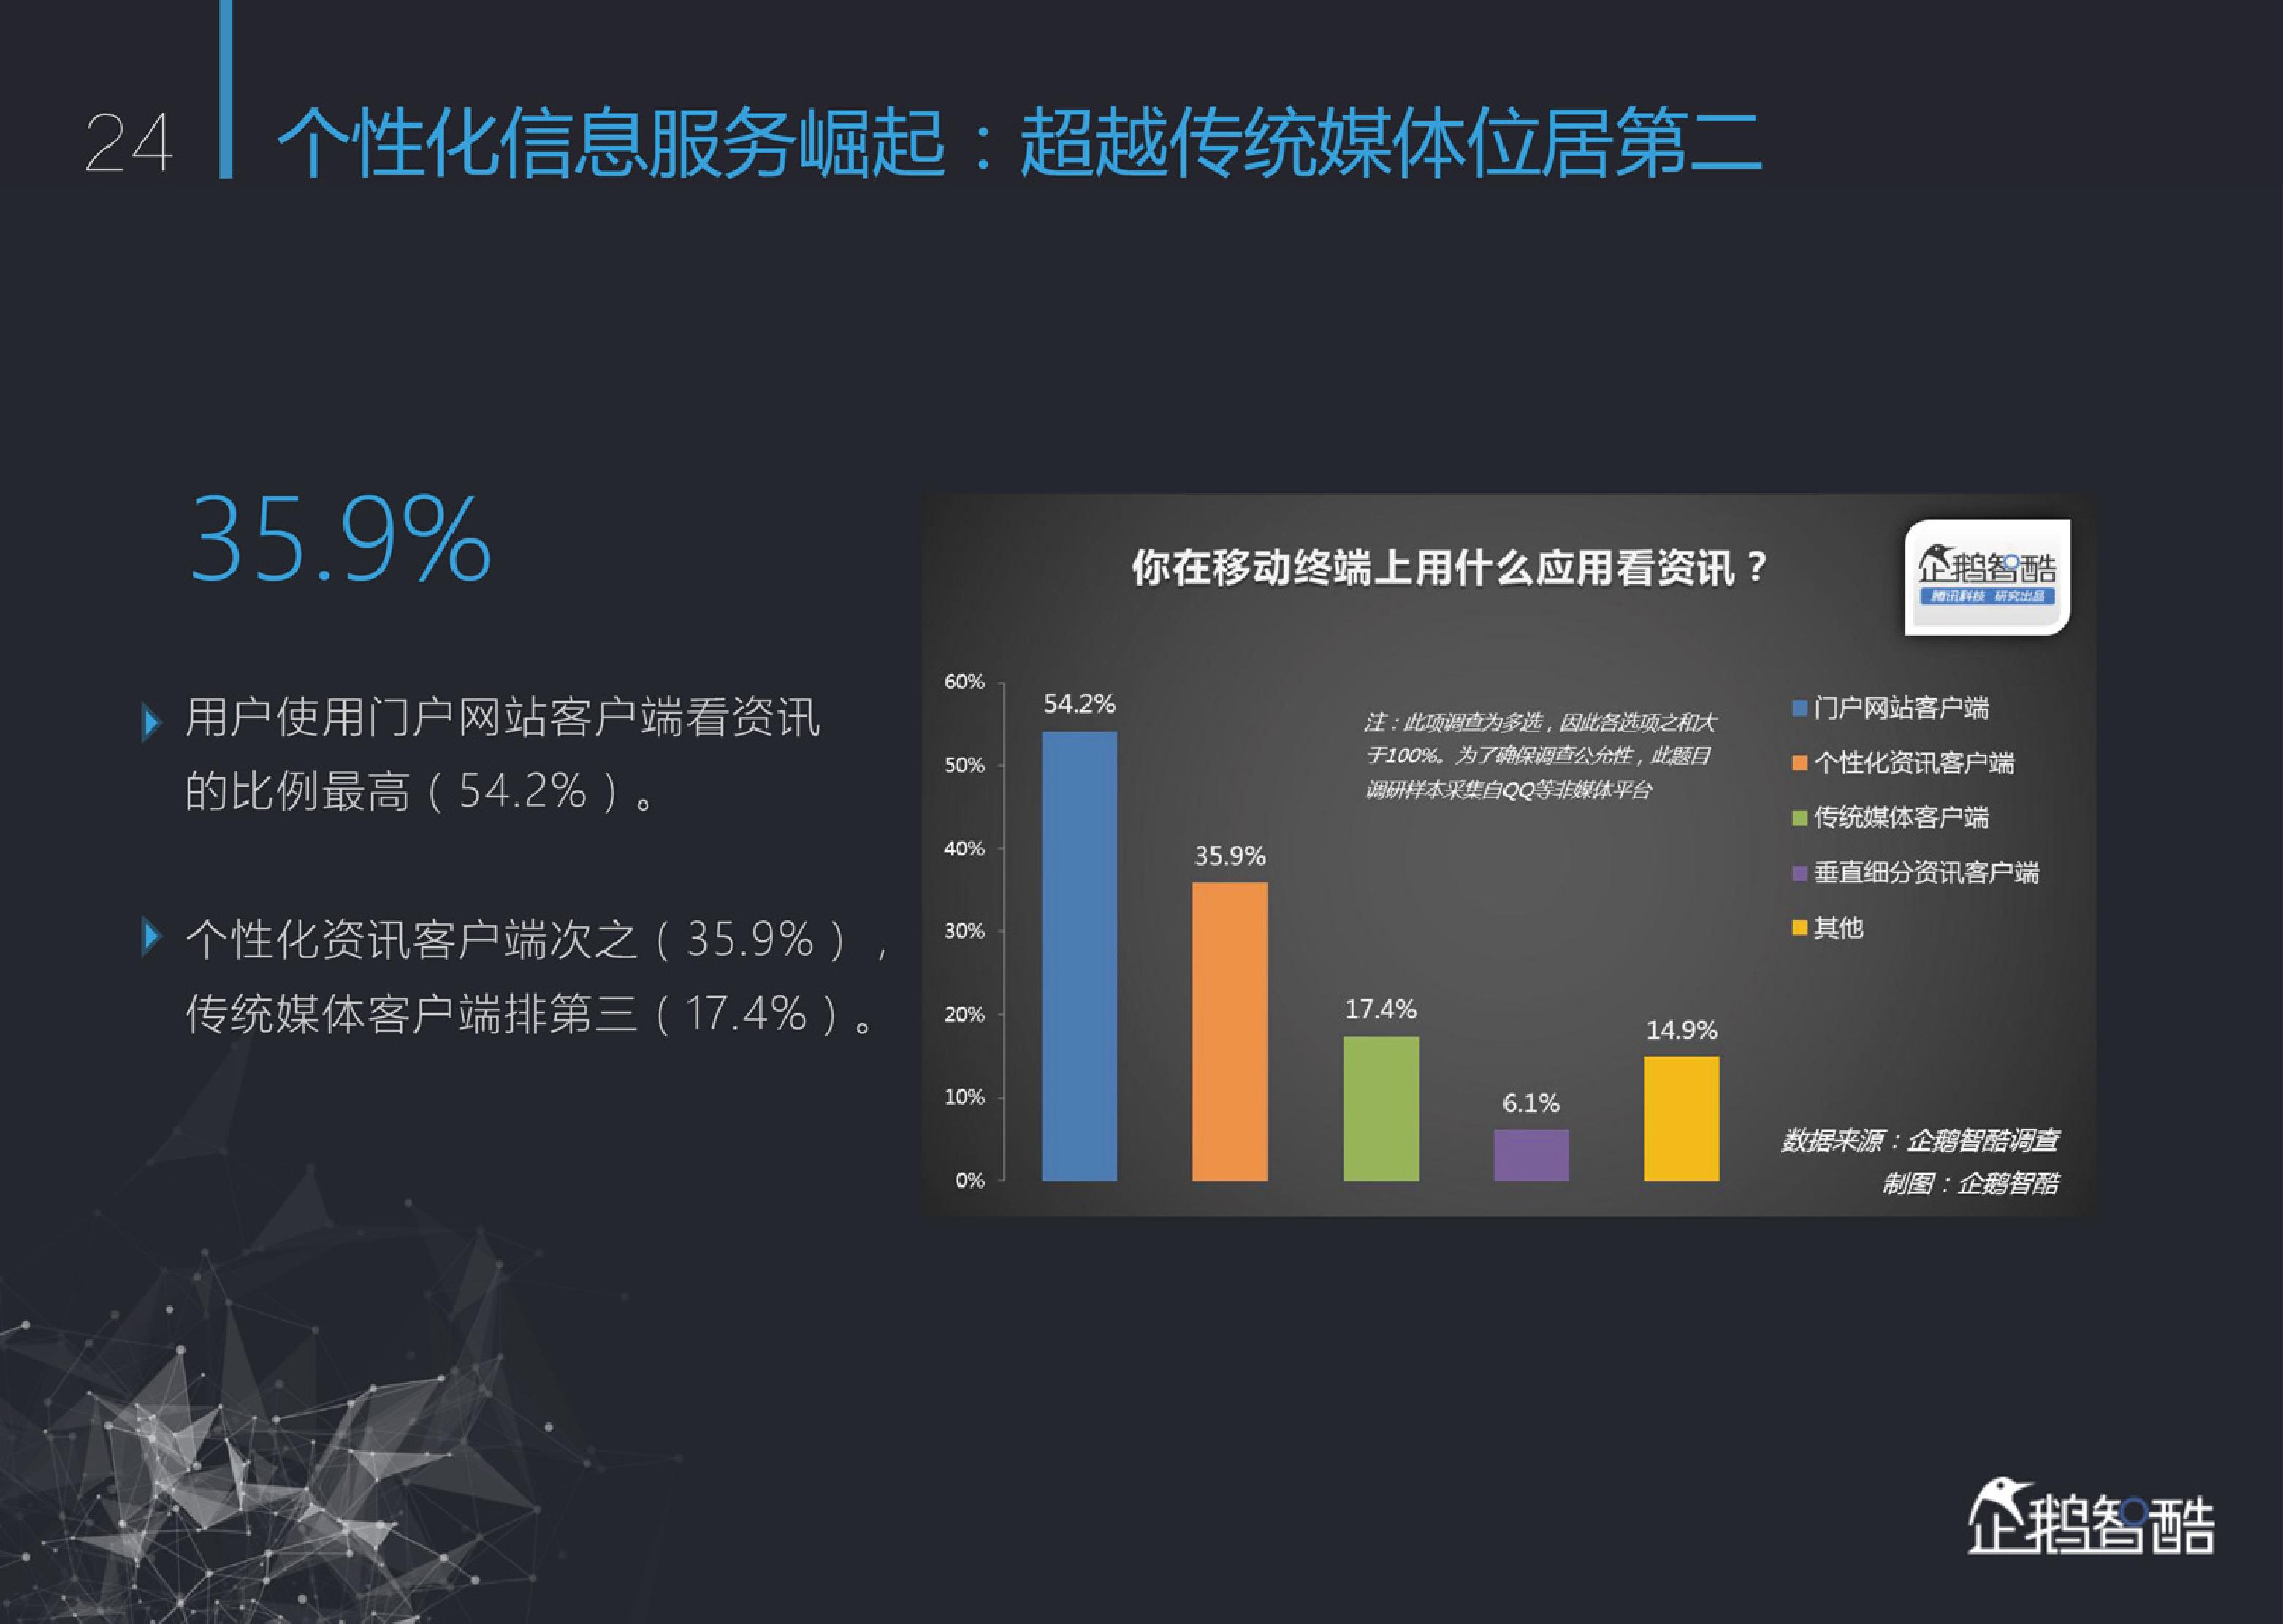 %e6%99%ba%e5%aa%92%e6%9d%a5%e4%b8%b4%ef%bc%9a2016%e4%b8%ad%e5%9b%bd%e6%96%b0%e5%aa%92%e4%bd%93%e8%b6%8b%e5%8a%bf%e6%8a%a5%e5%91%8a-%e4%bc%81%e9%b9%85%e6%99%ba%e9%85%b7_000025